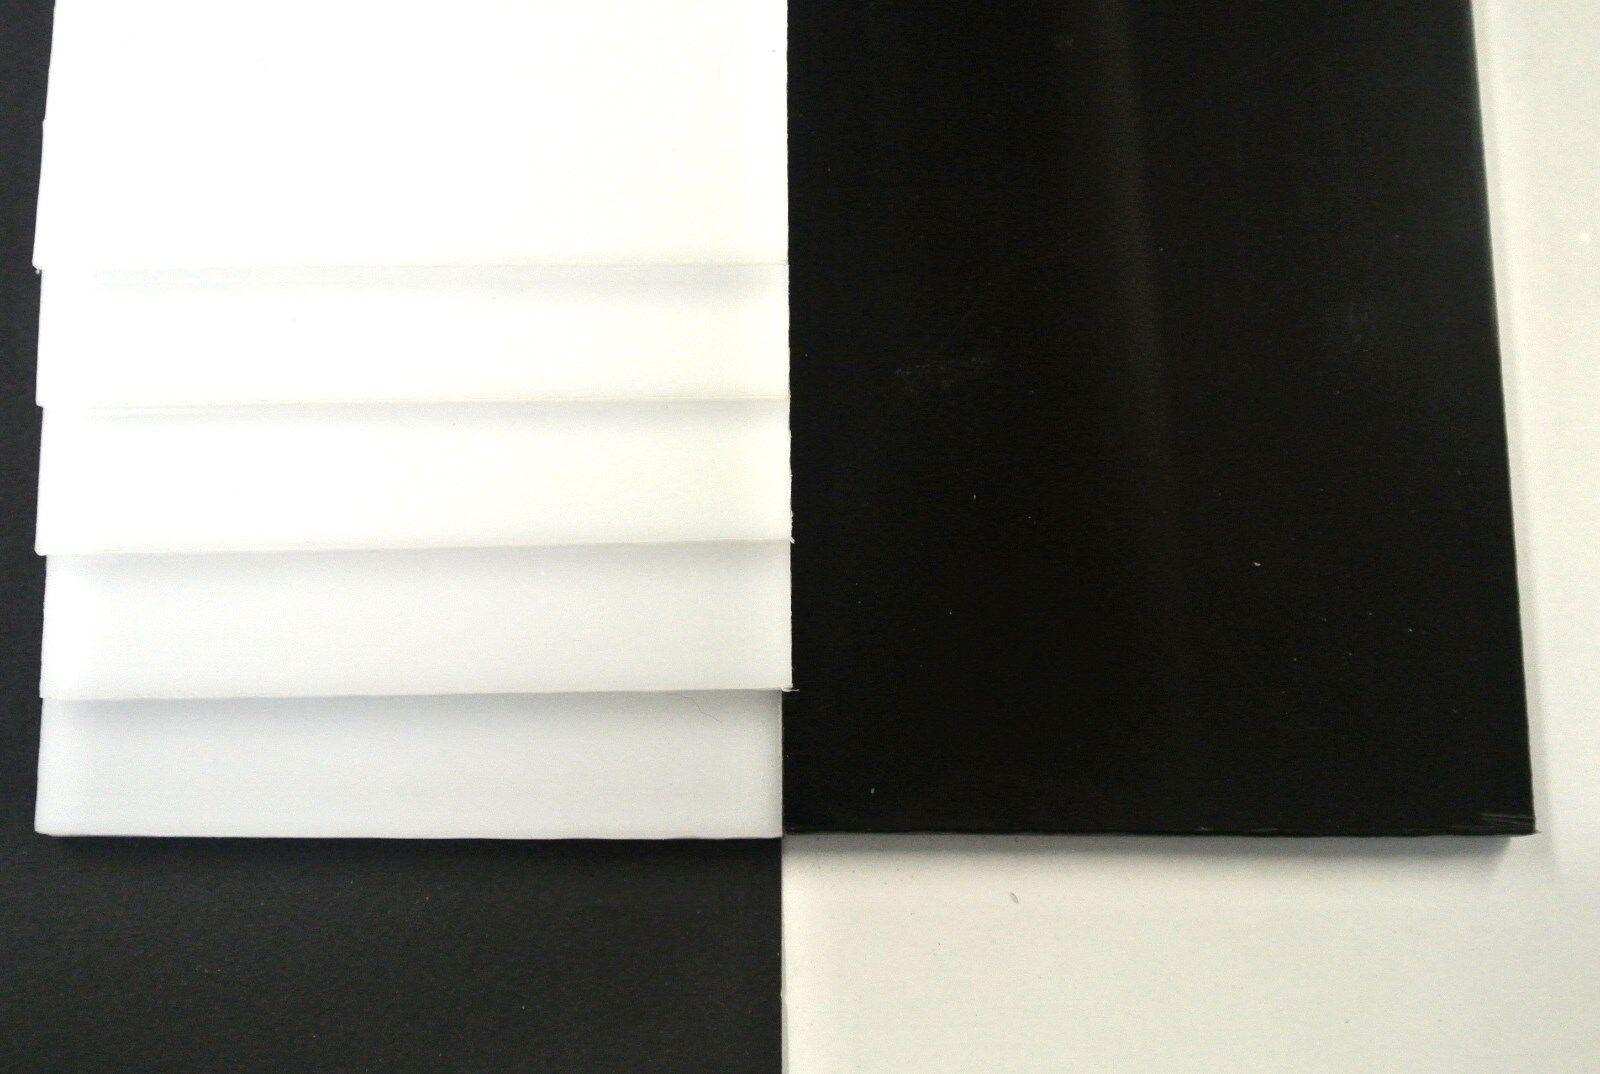 Acetal Flat Black White Engineering Plastic Sheet 2mm-12mm Thick Various Lengths